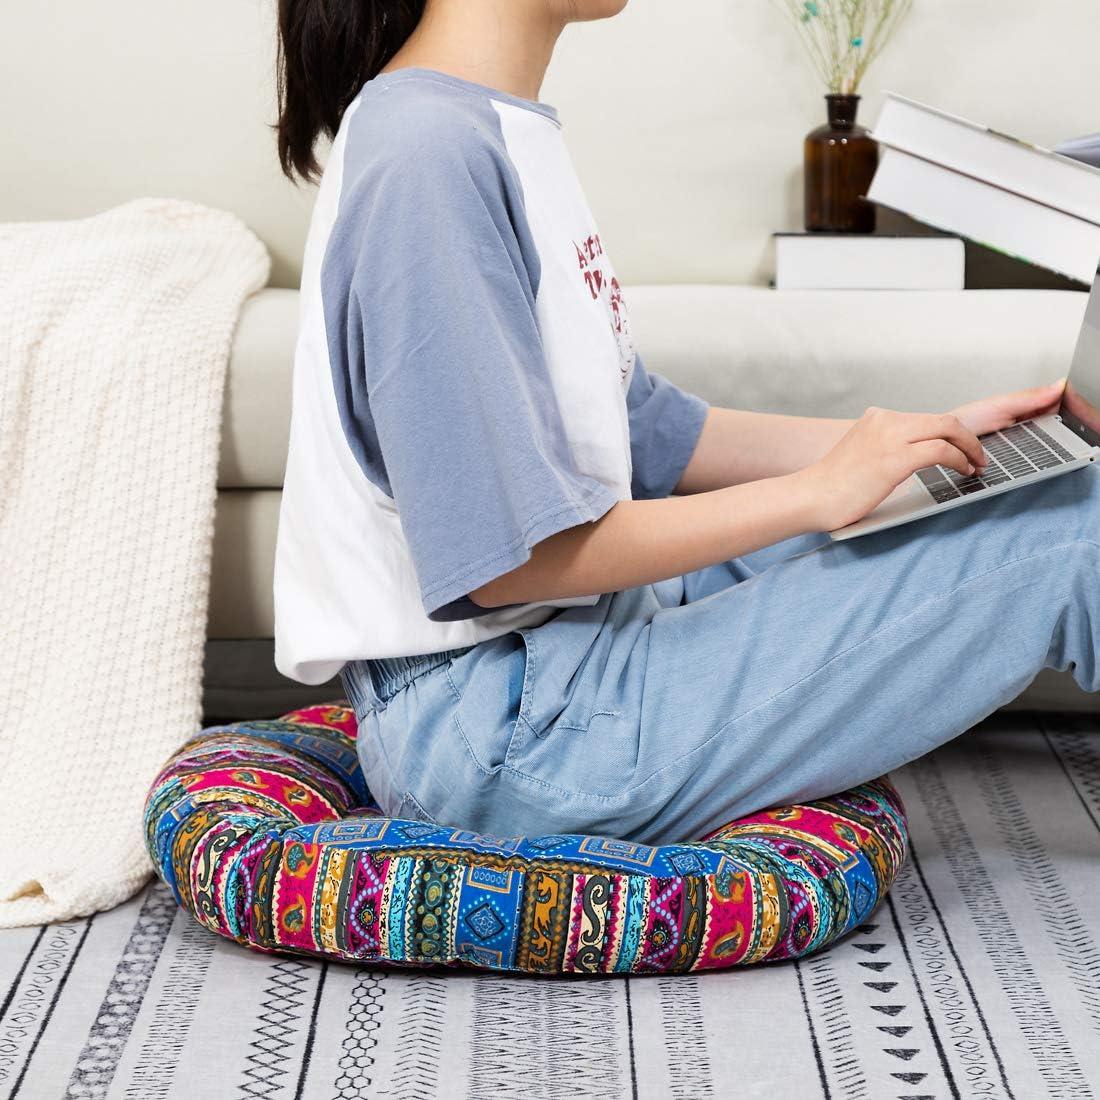 HIGOGOGO Meditation Cushion, Elephant Pattern Mandala Bohemian Style Floor Pillow Round Cotton Linen Boho Indian Seat Cushion Yoga Pillow for Floor Reading Book Bay Window, 22 Inch, Black 71aKGcM8oQL